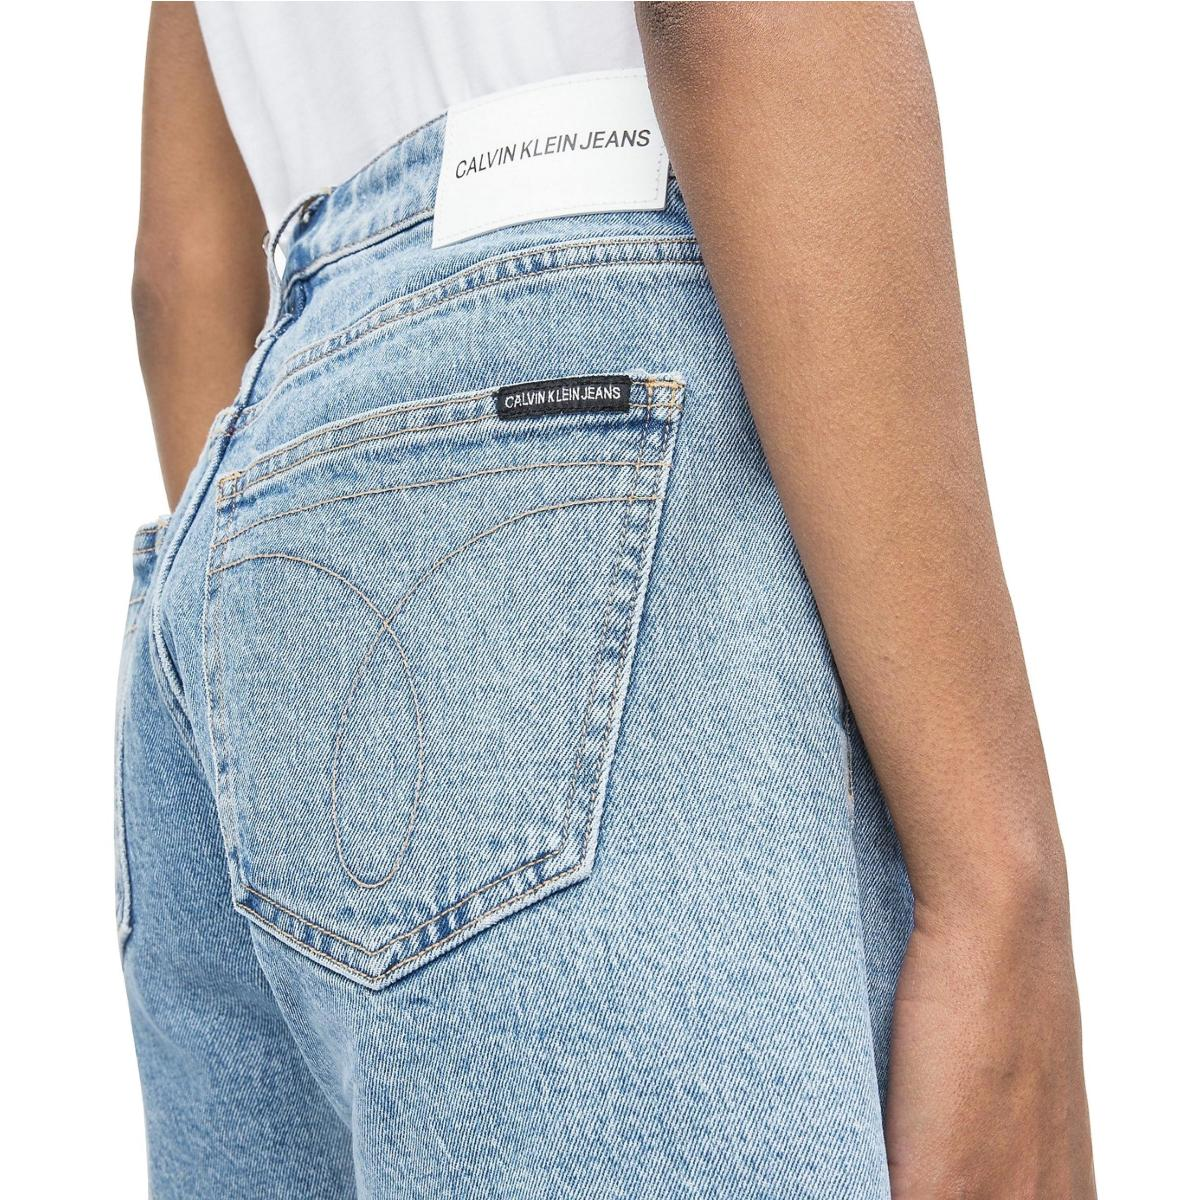 Pantaloncini shorts Calvin Klein Jeans in denim a vita media da donna rif. J20J212038